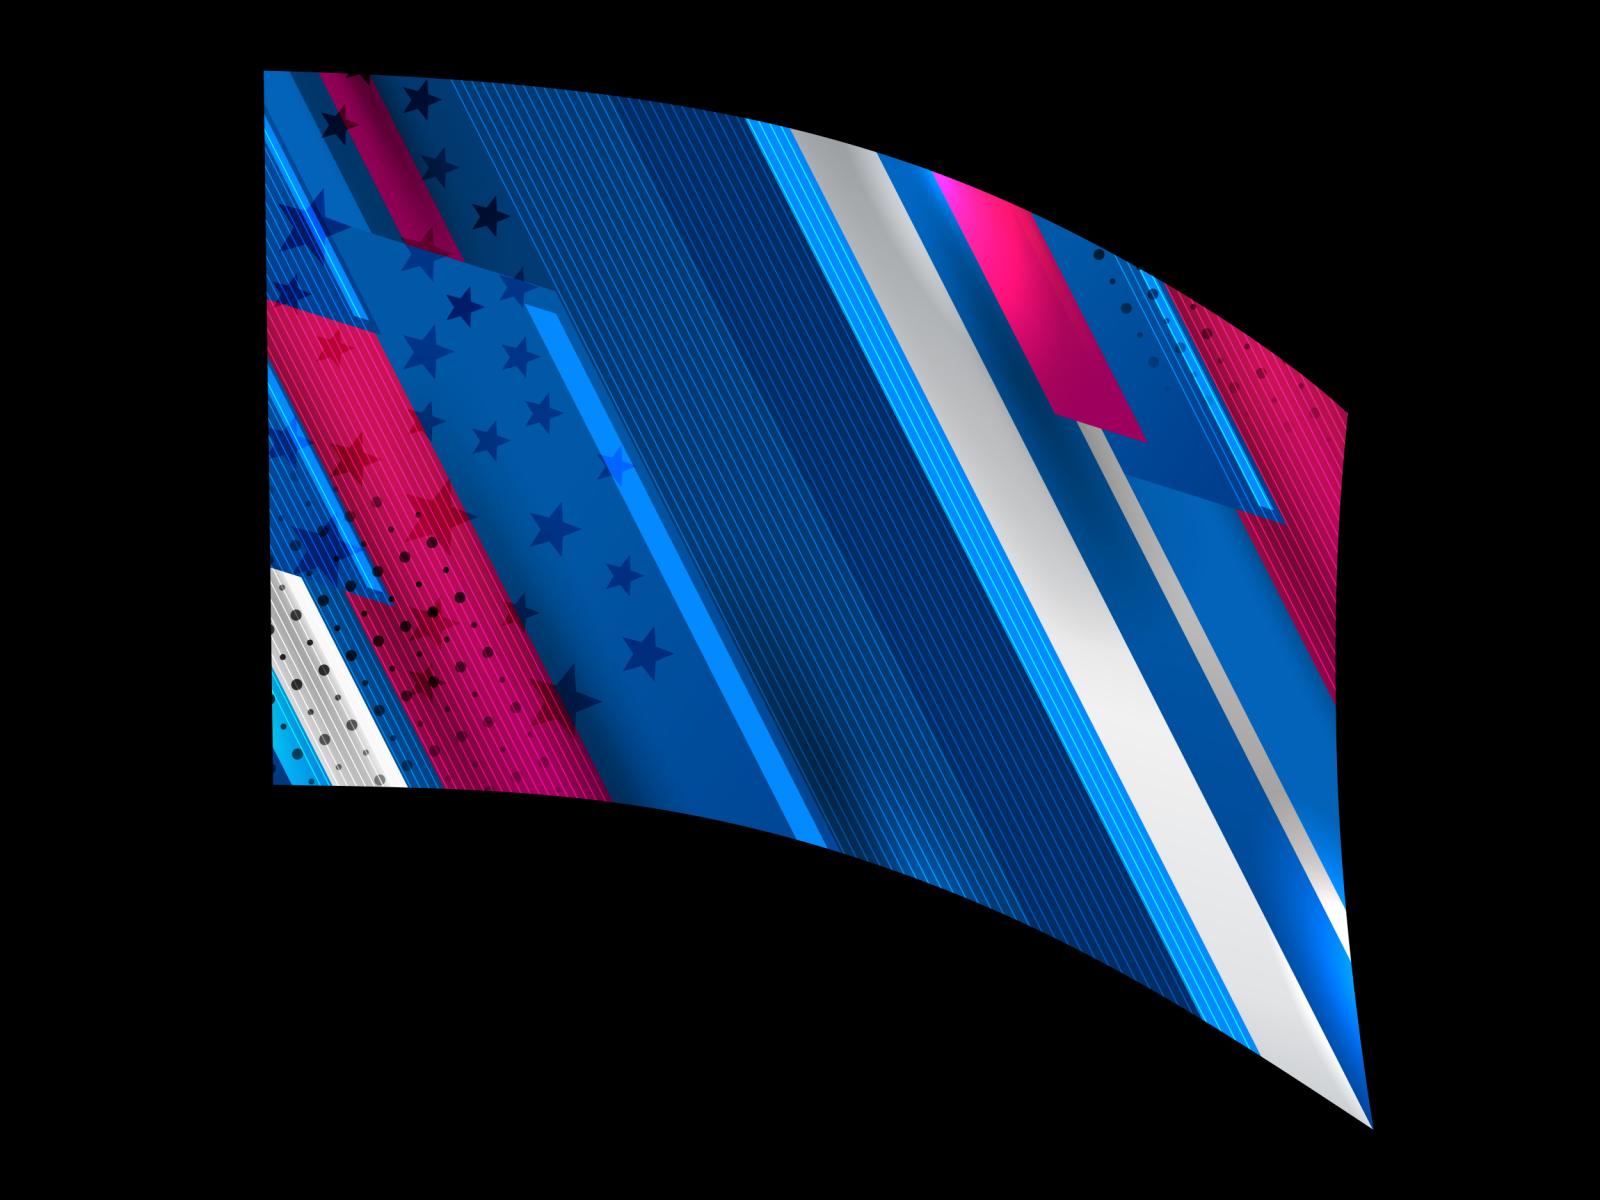 060223s - 36x52 Standard Patriotic 7